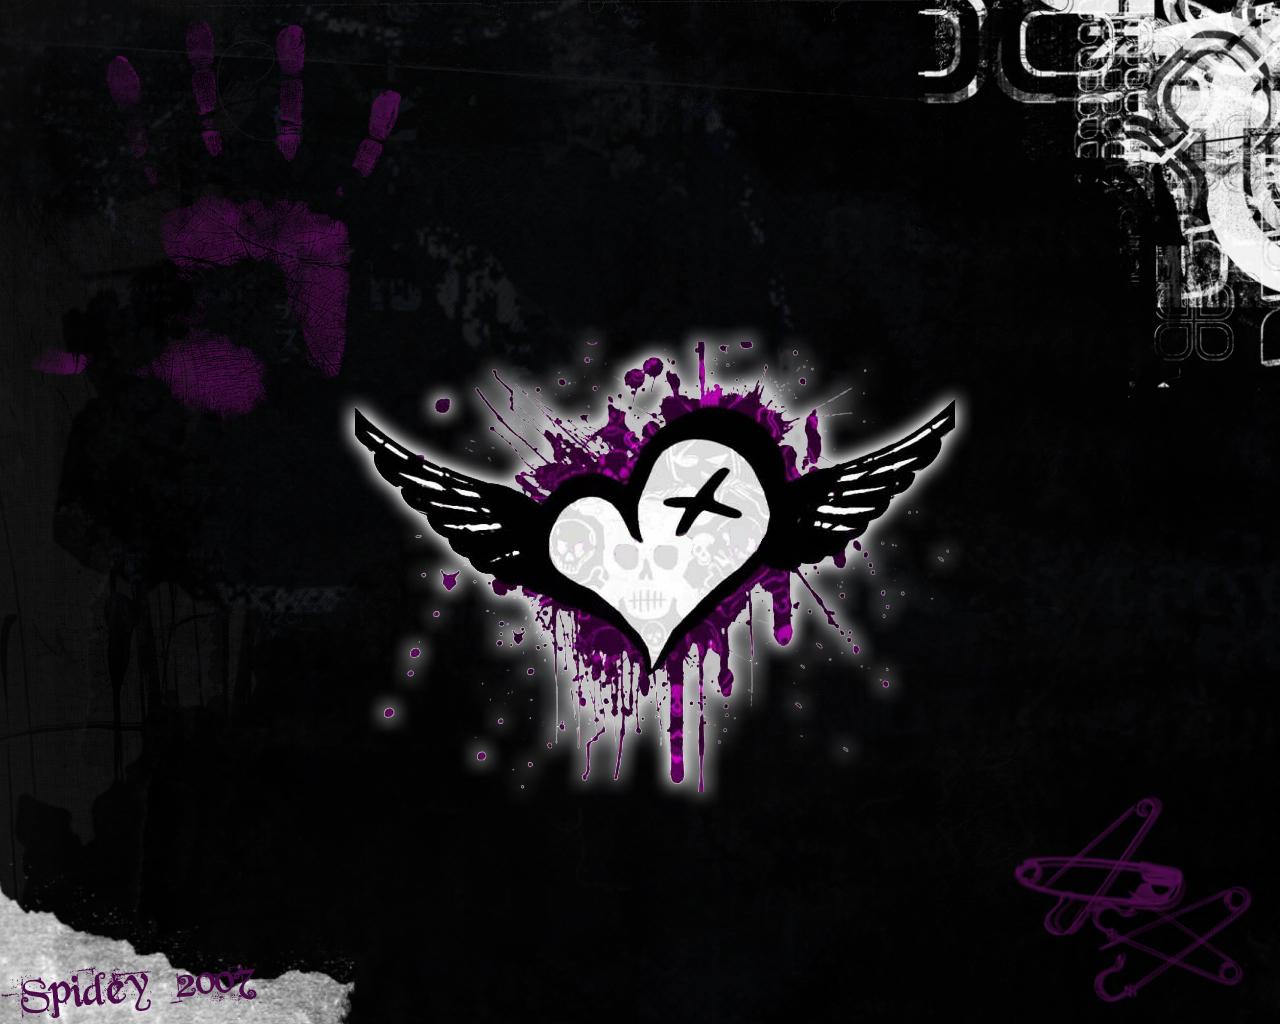 Pics Photos   Black Heart Anime Emo Girls Wallpapers Jpg 1280x1024